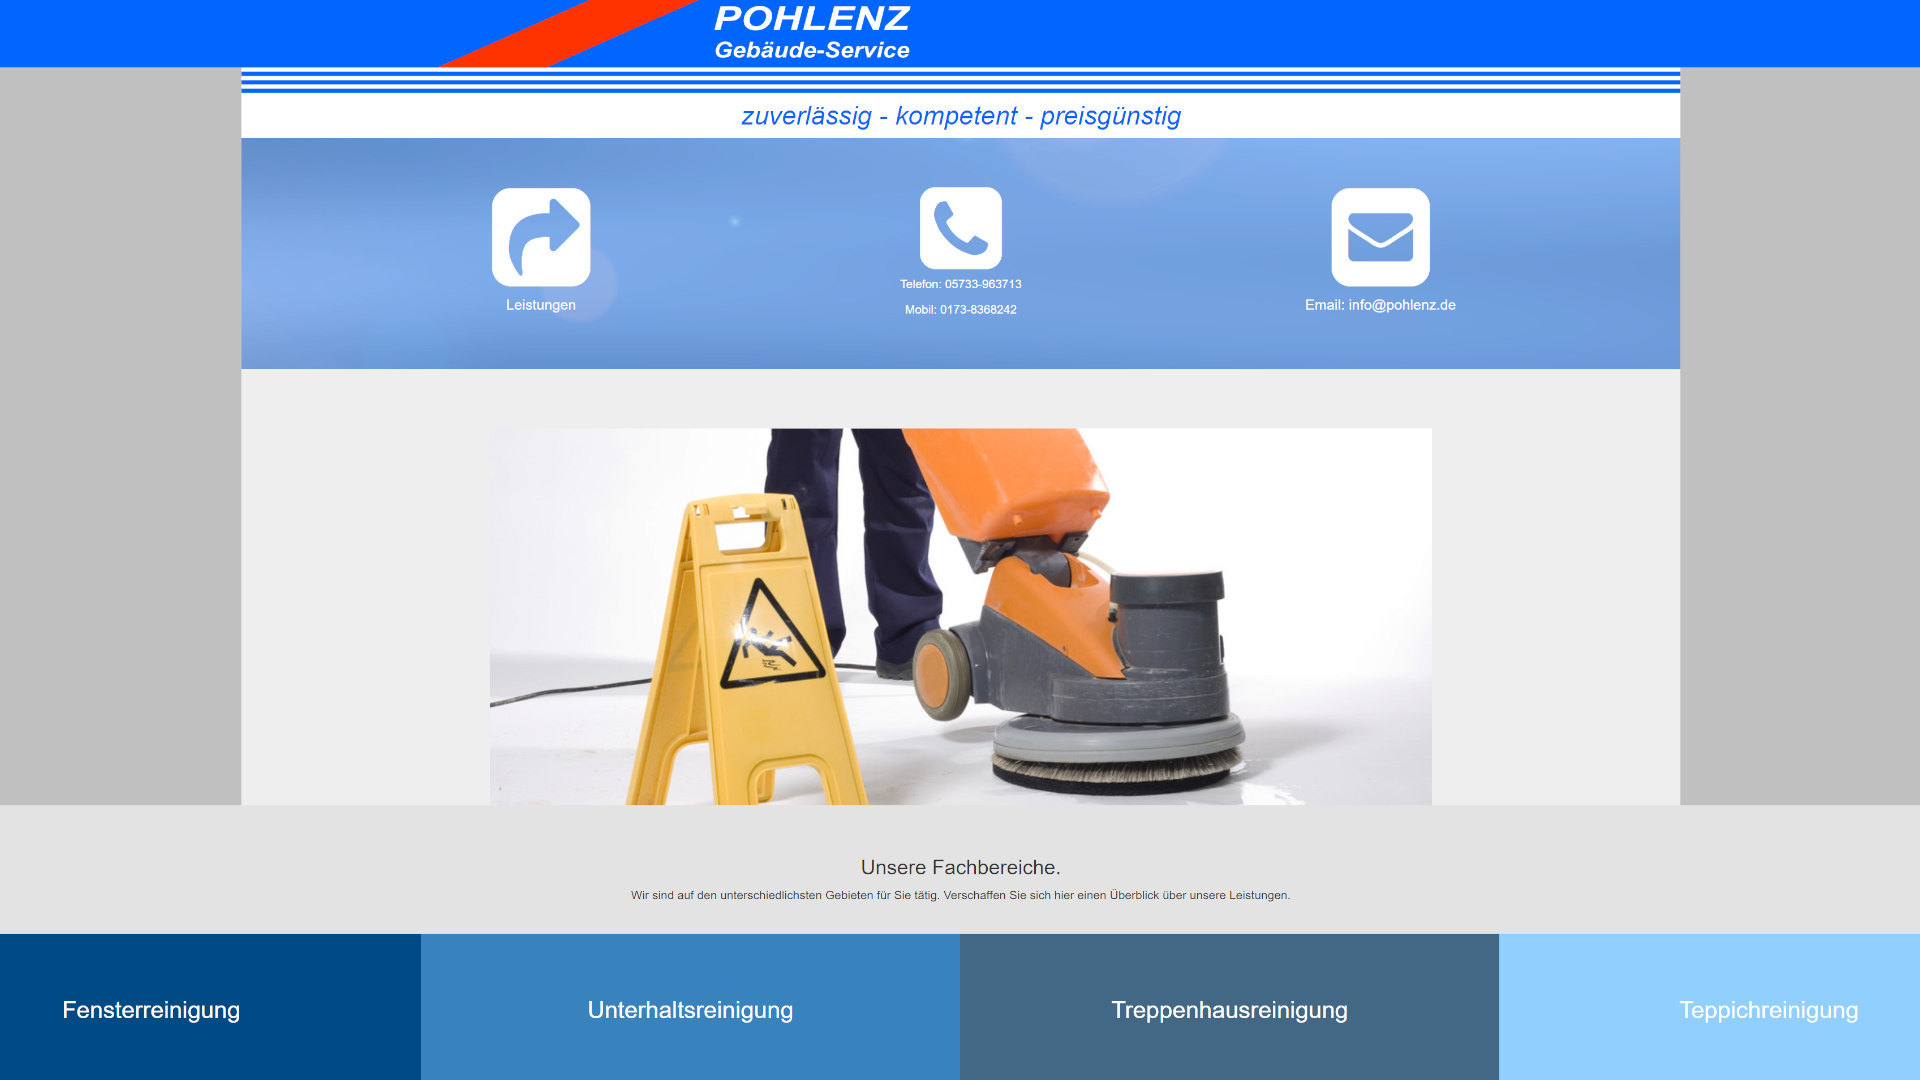 Screenshot: Homepage Pohlenz Gebäudeservice